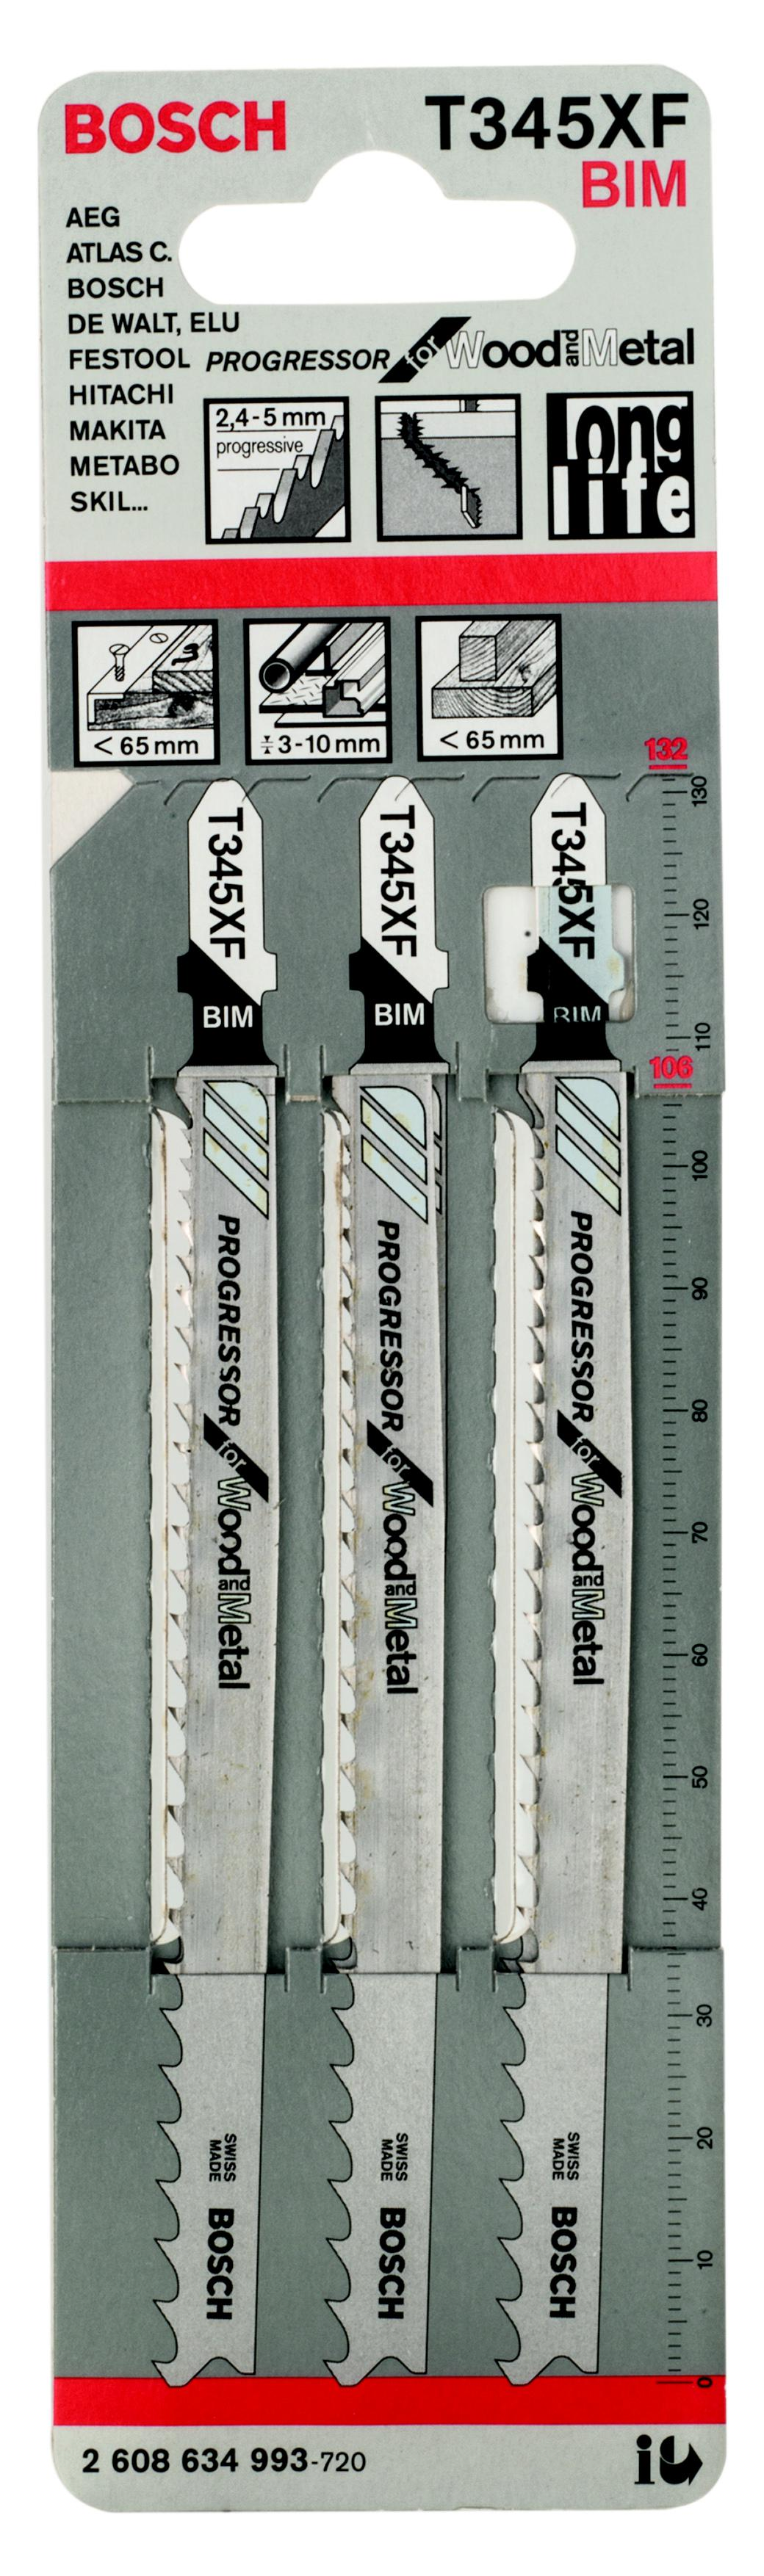 Пилки для лобзика Bosch T345xf progressor (2.608.634.993) пилки для лобзика универсальные t345xf 2 шт 10 70 мм практика стандарт